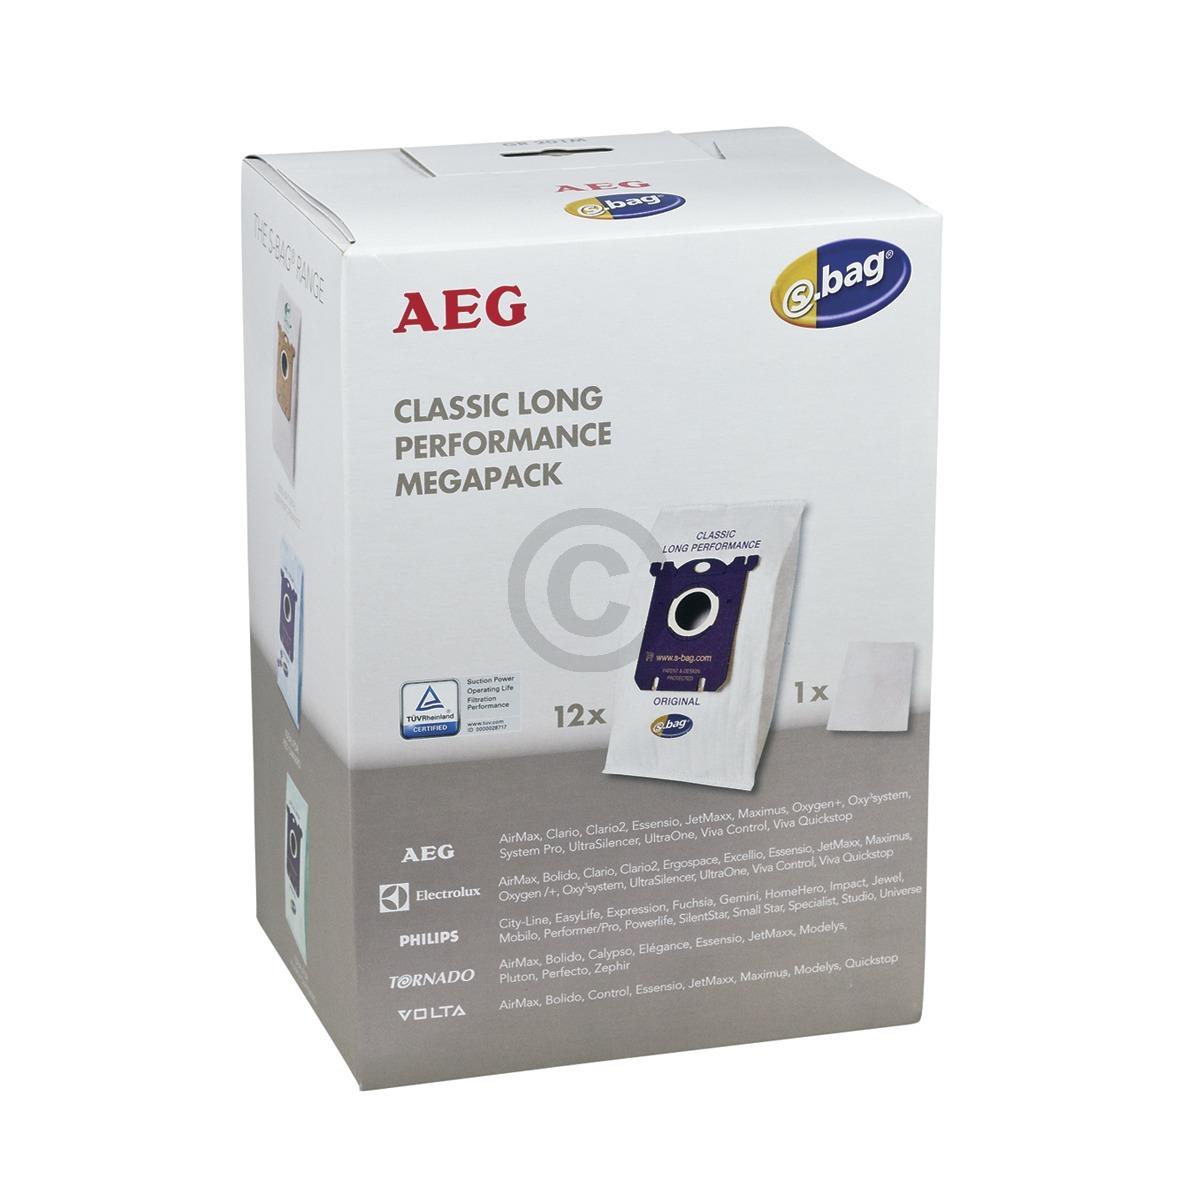 10x Dust bags microfibre for VOLTA Essensio JetMaxx